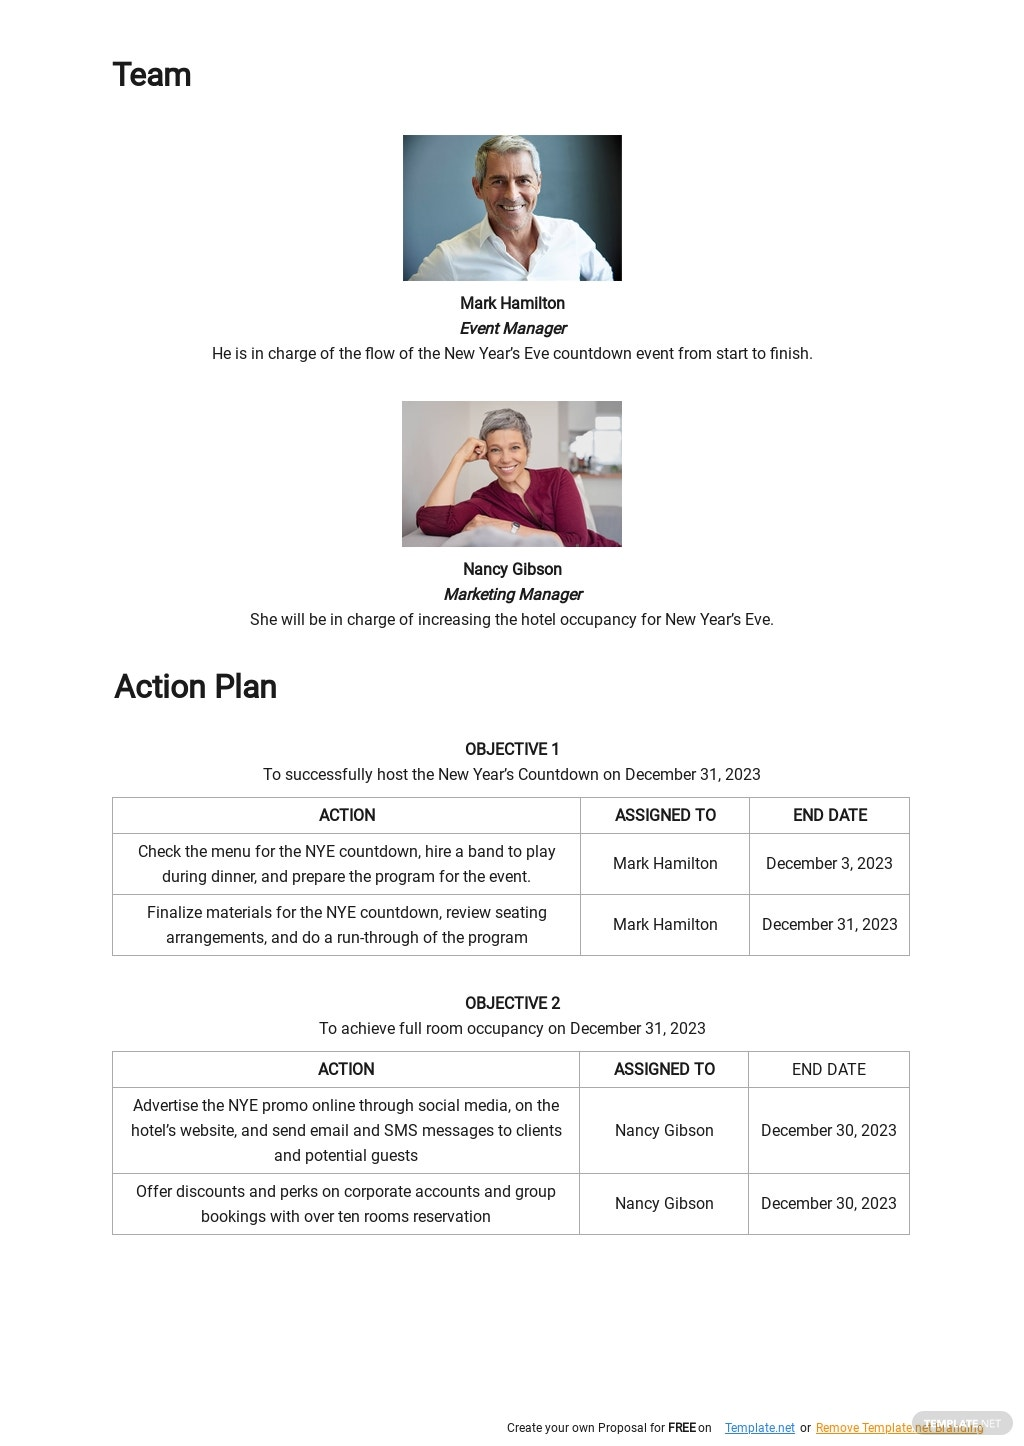 Free Strategic Goals Marketing Plan Template 2.jpe